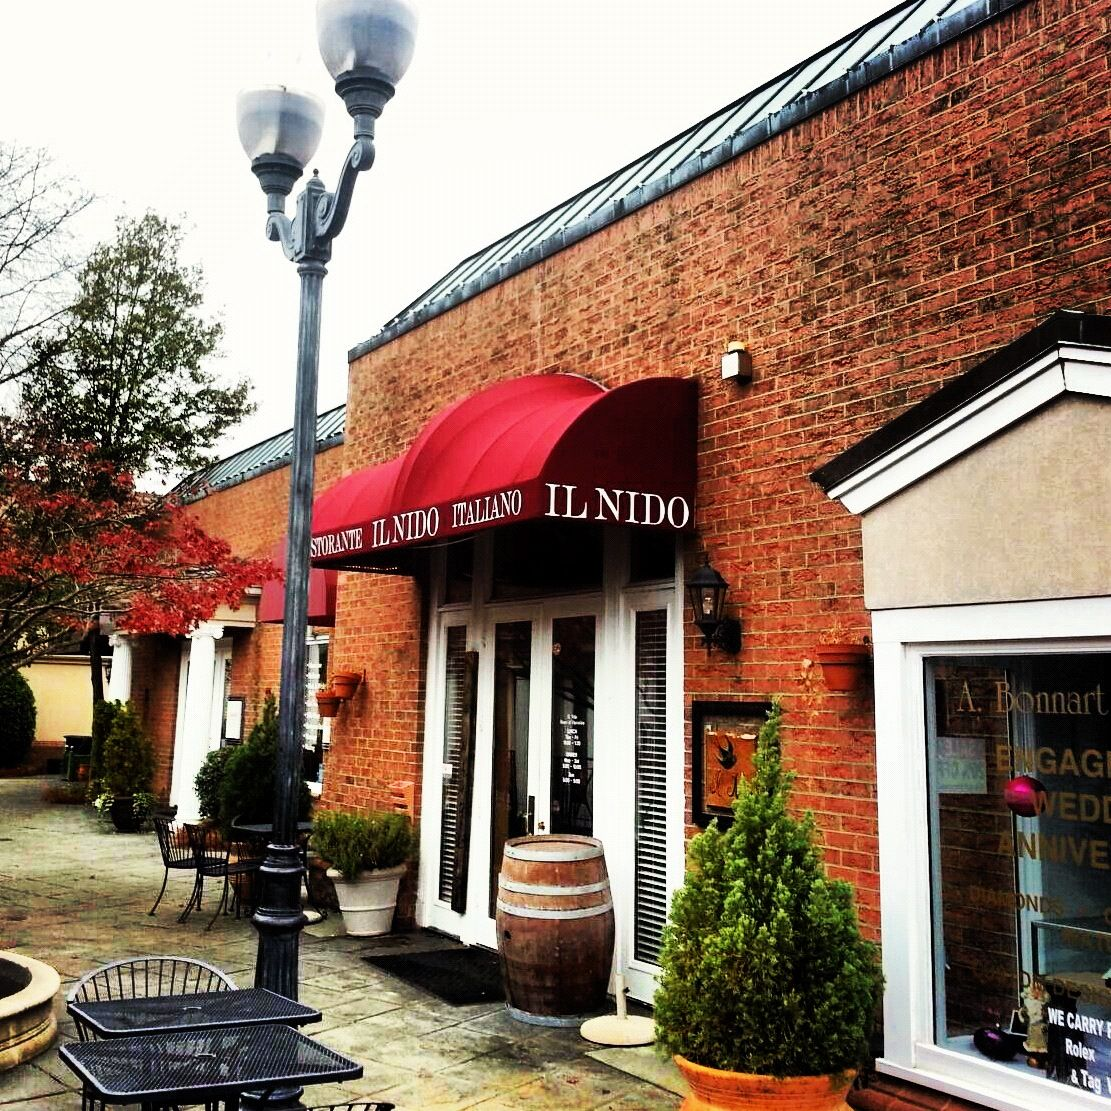 beautiful entrance awning recover for il nido italian ristorante